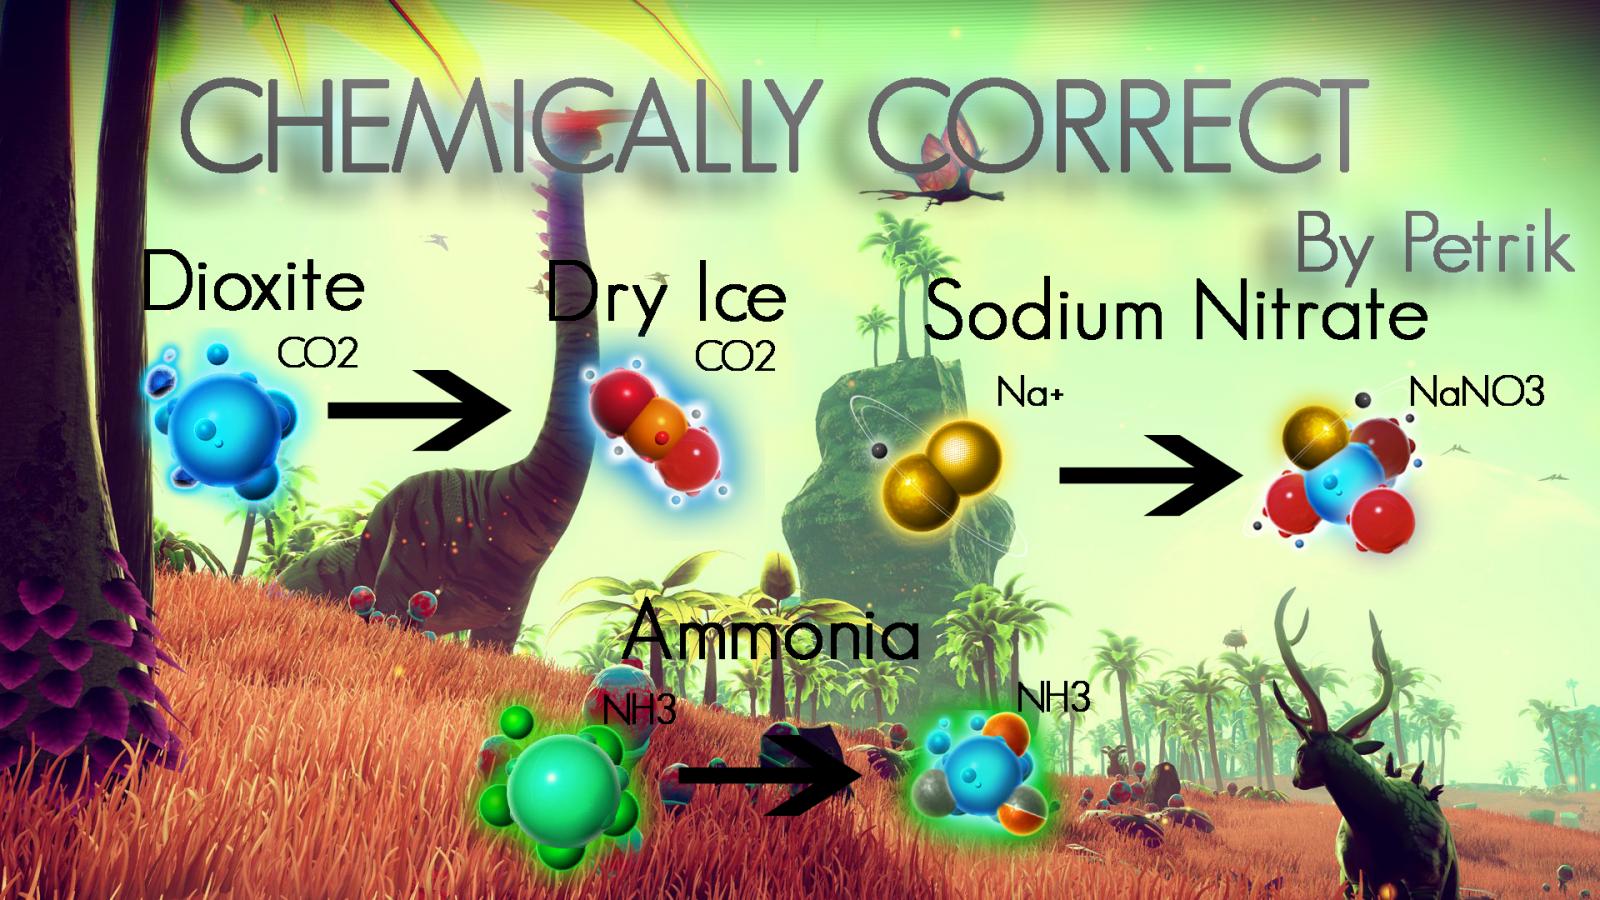 Chemically Correct